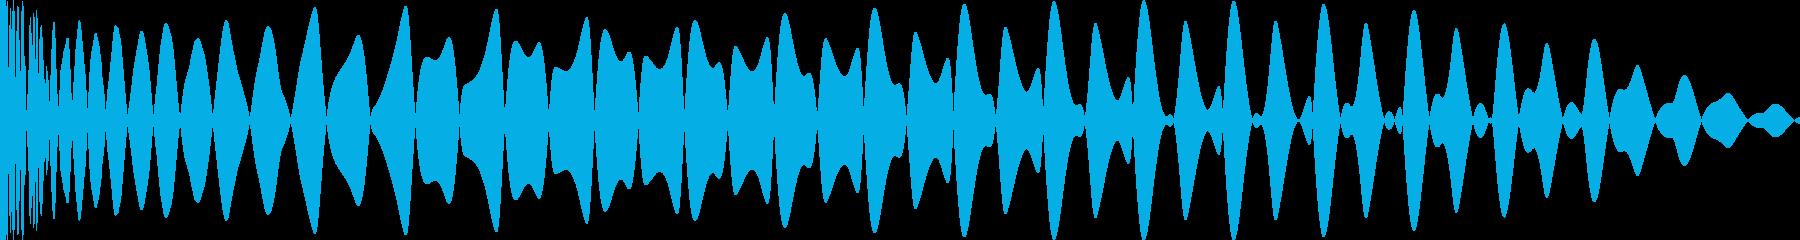 EDMキー入り(F)キックです。の再生済みの波形